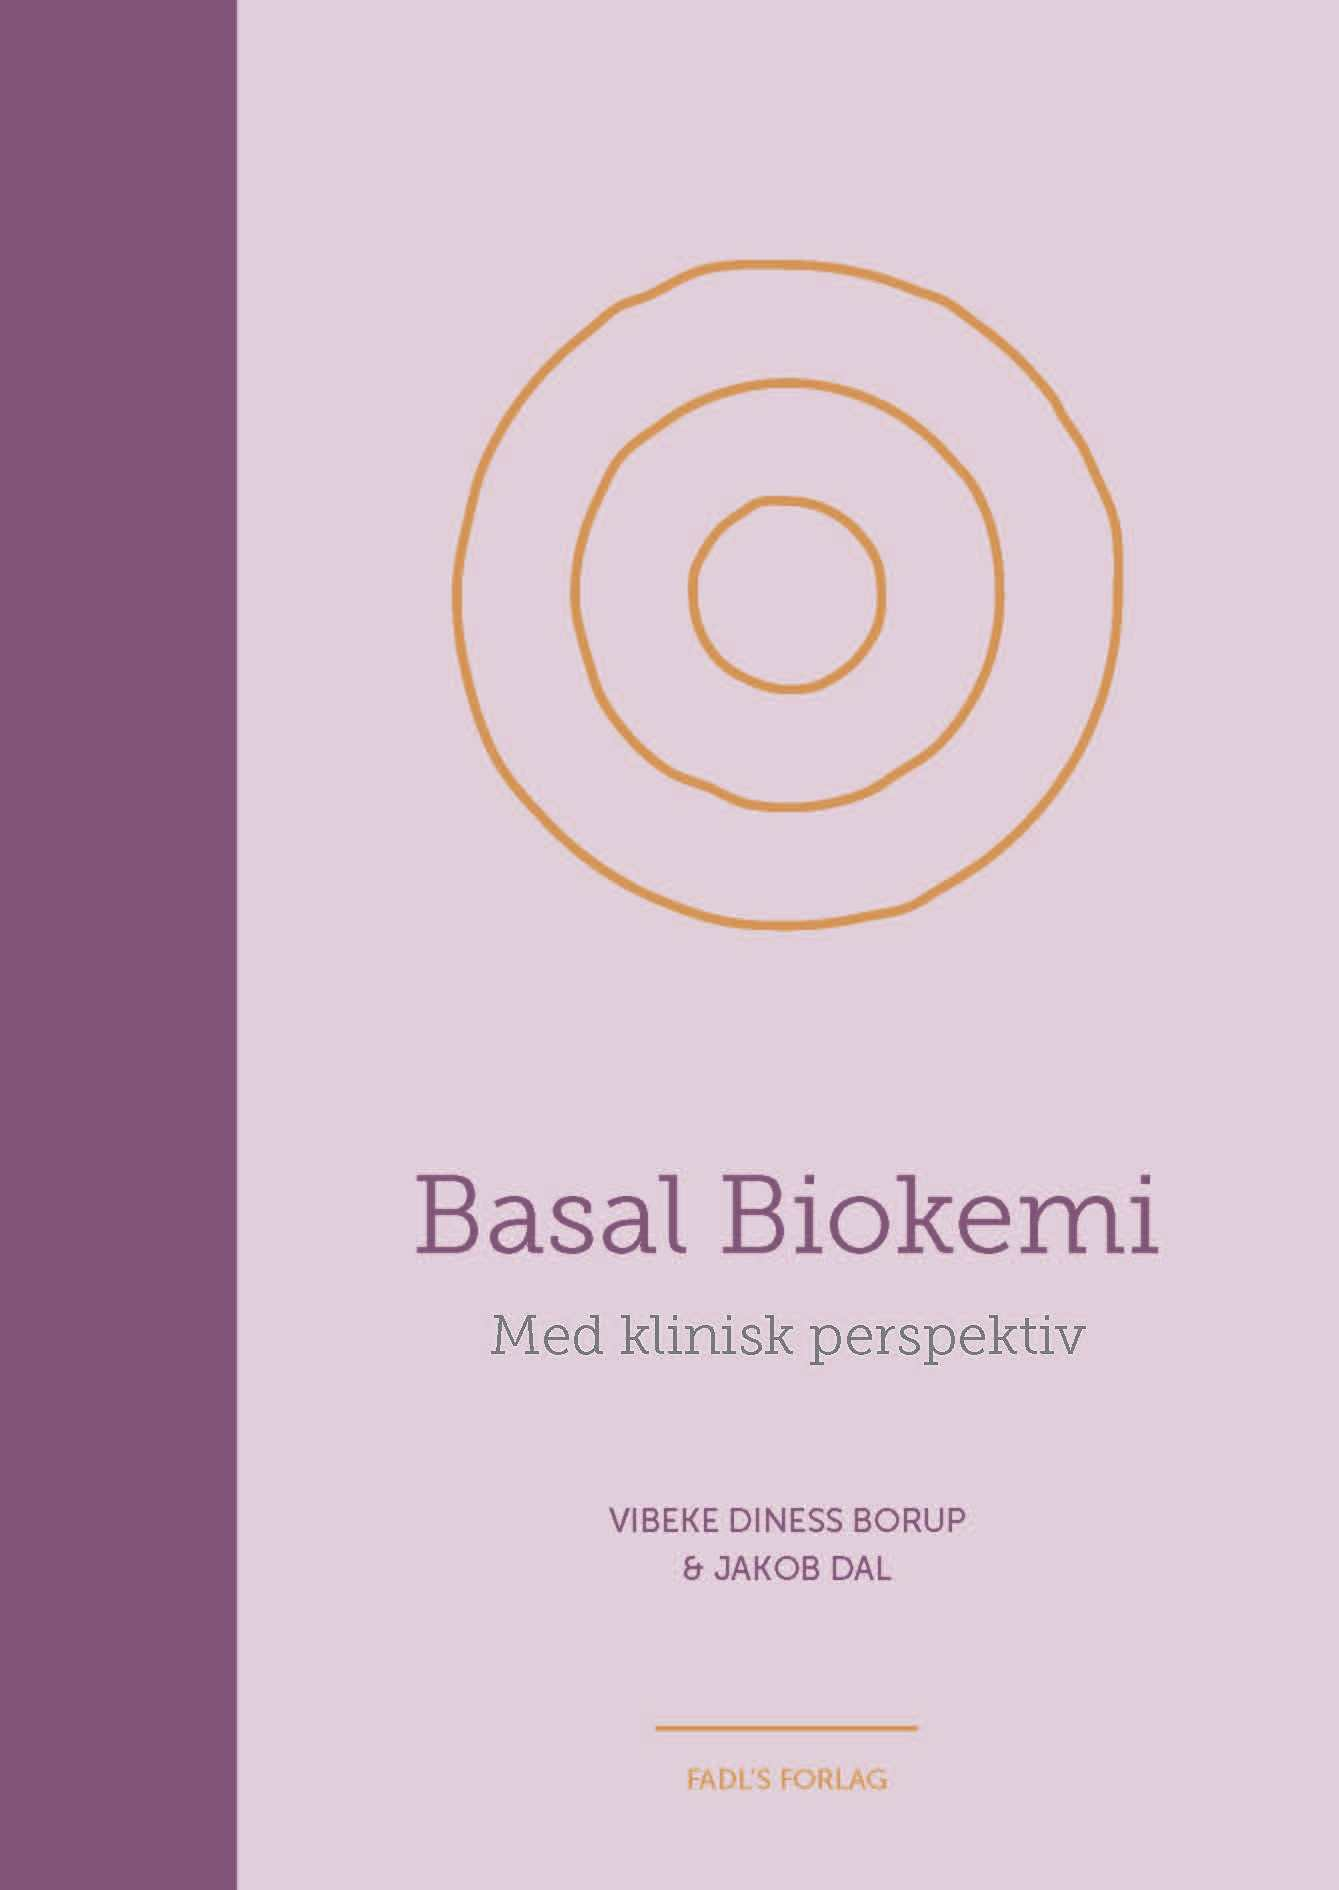 Basal biokemi